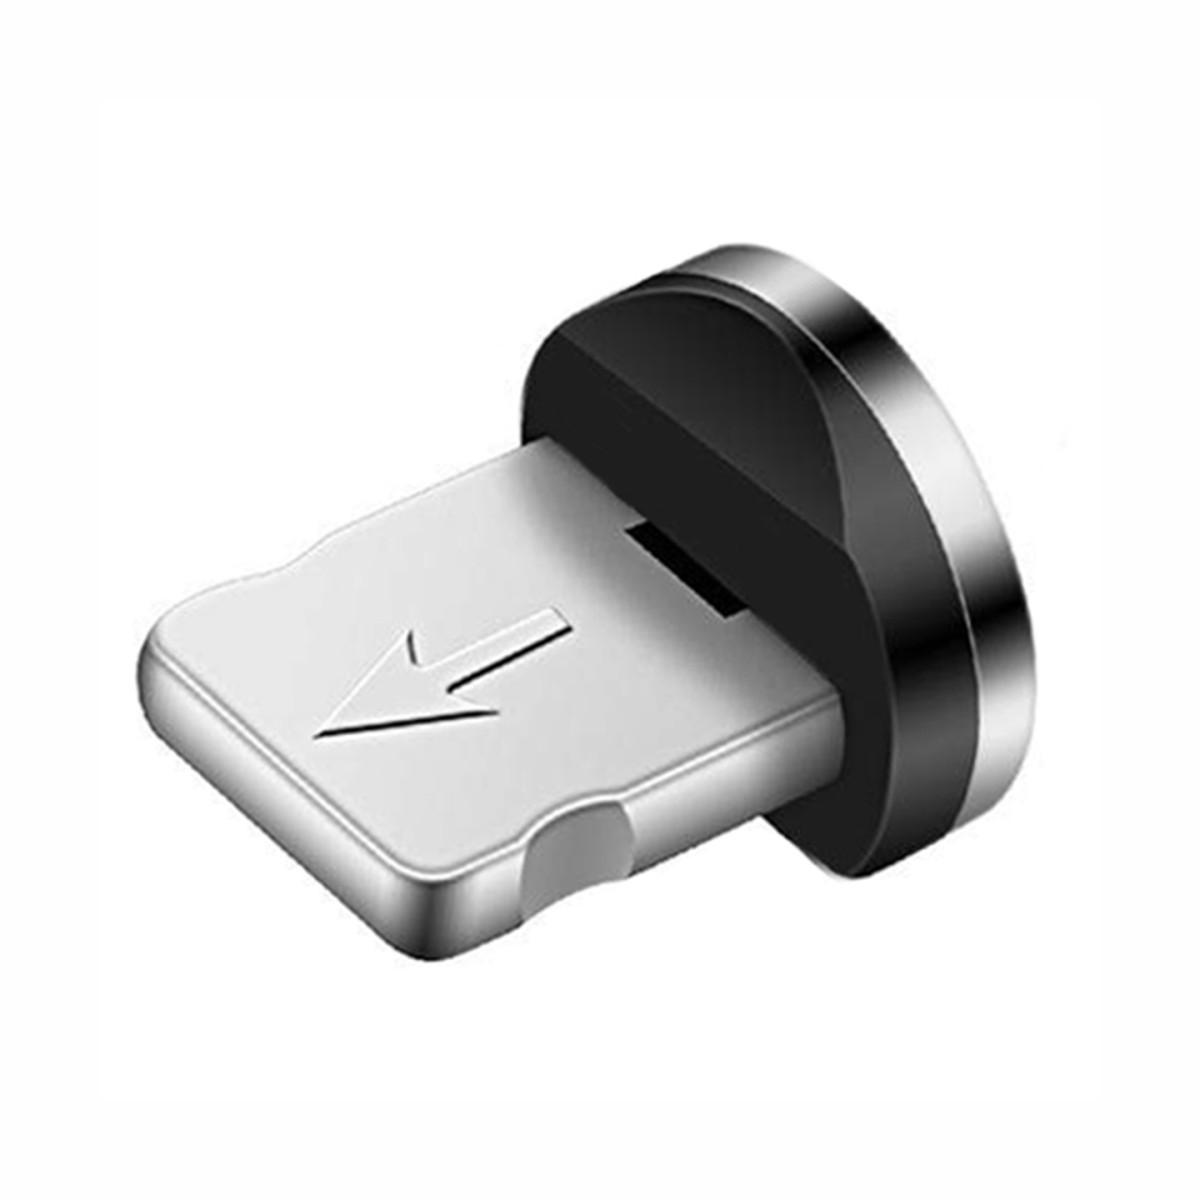 Конектор магнітний SKY/TOPK (Conect R) Apple-lightning